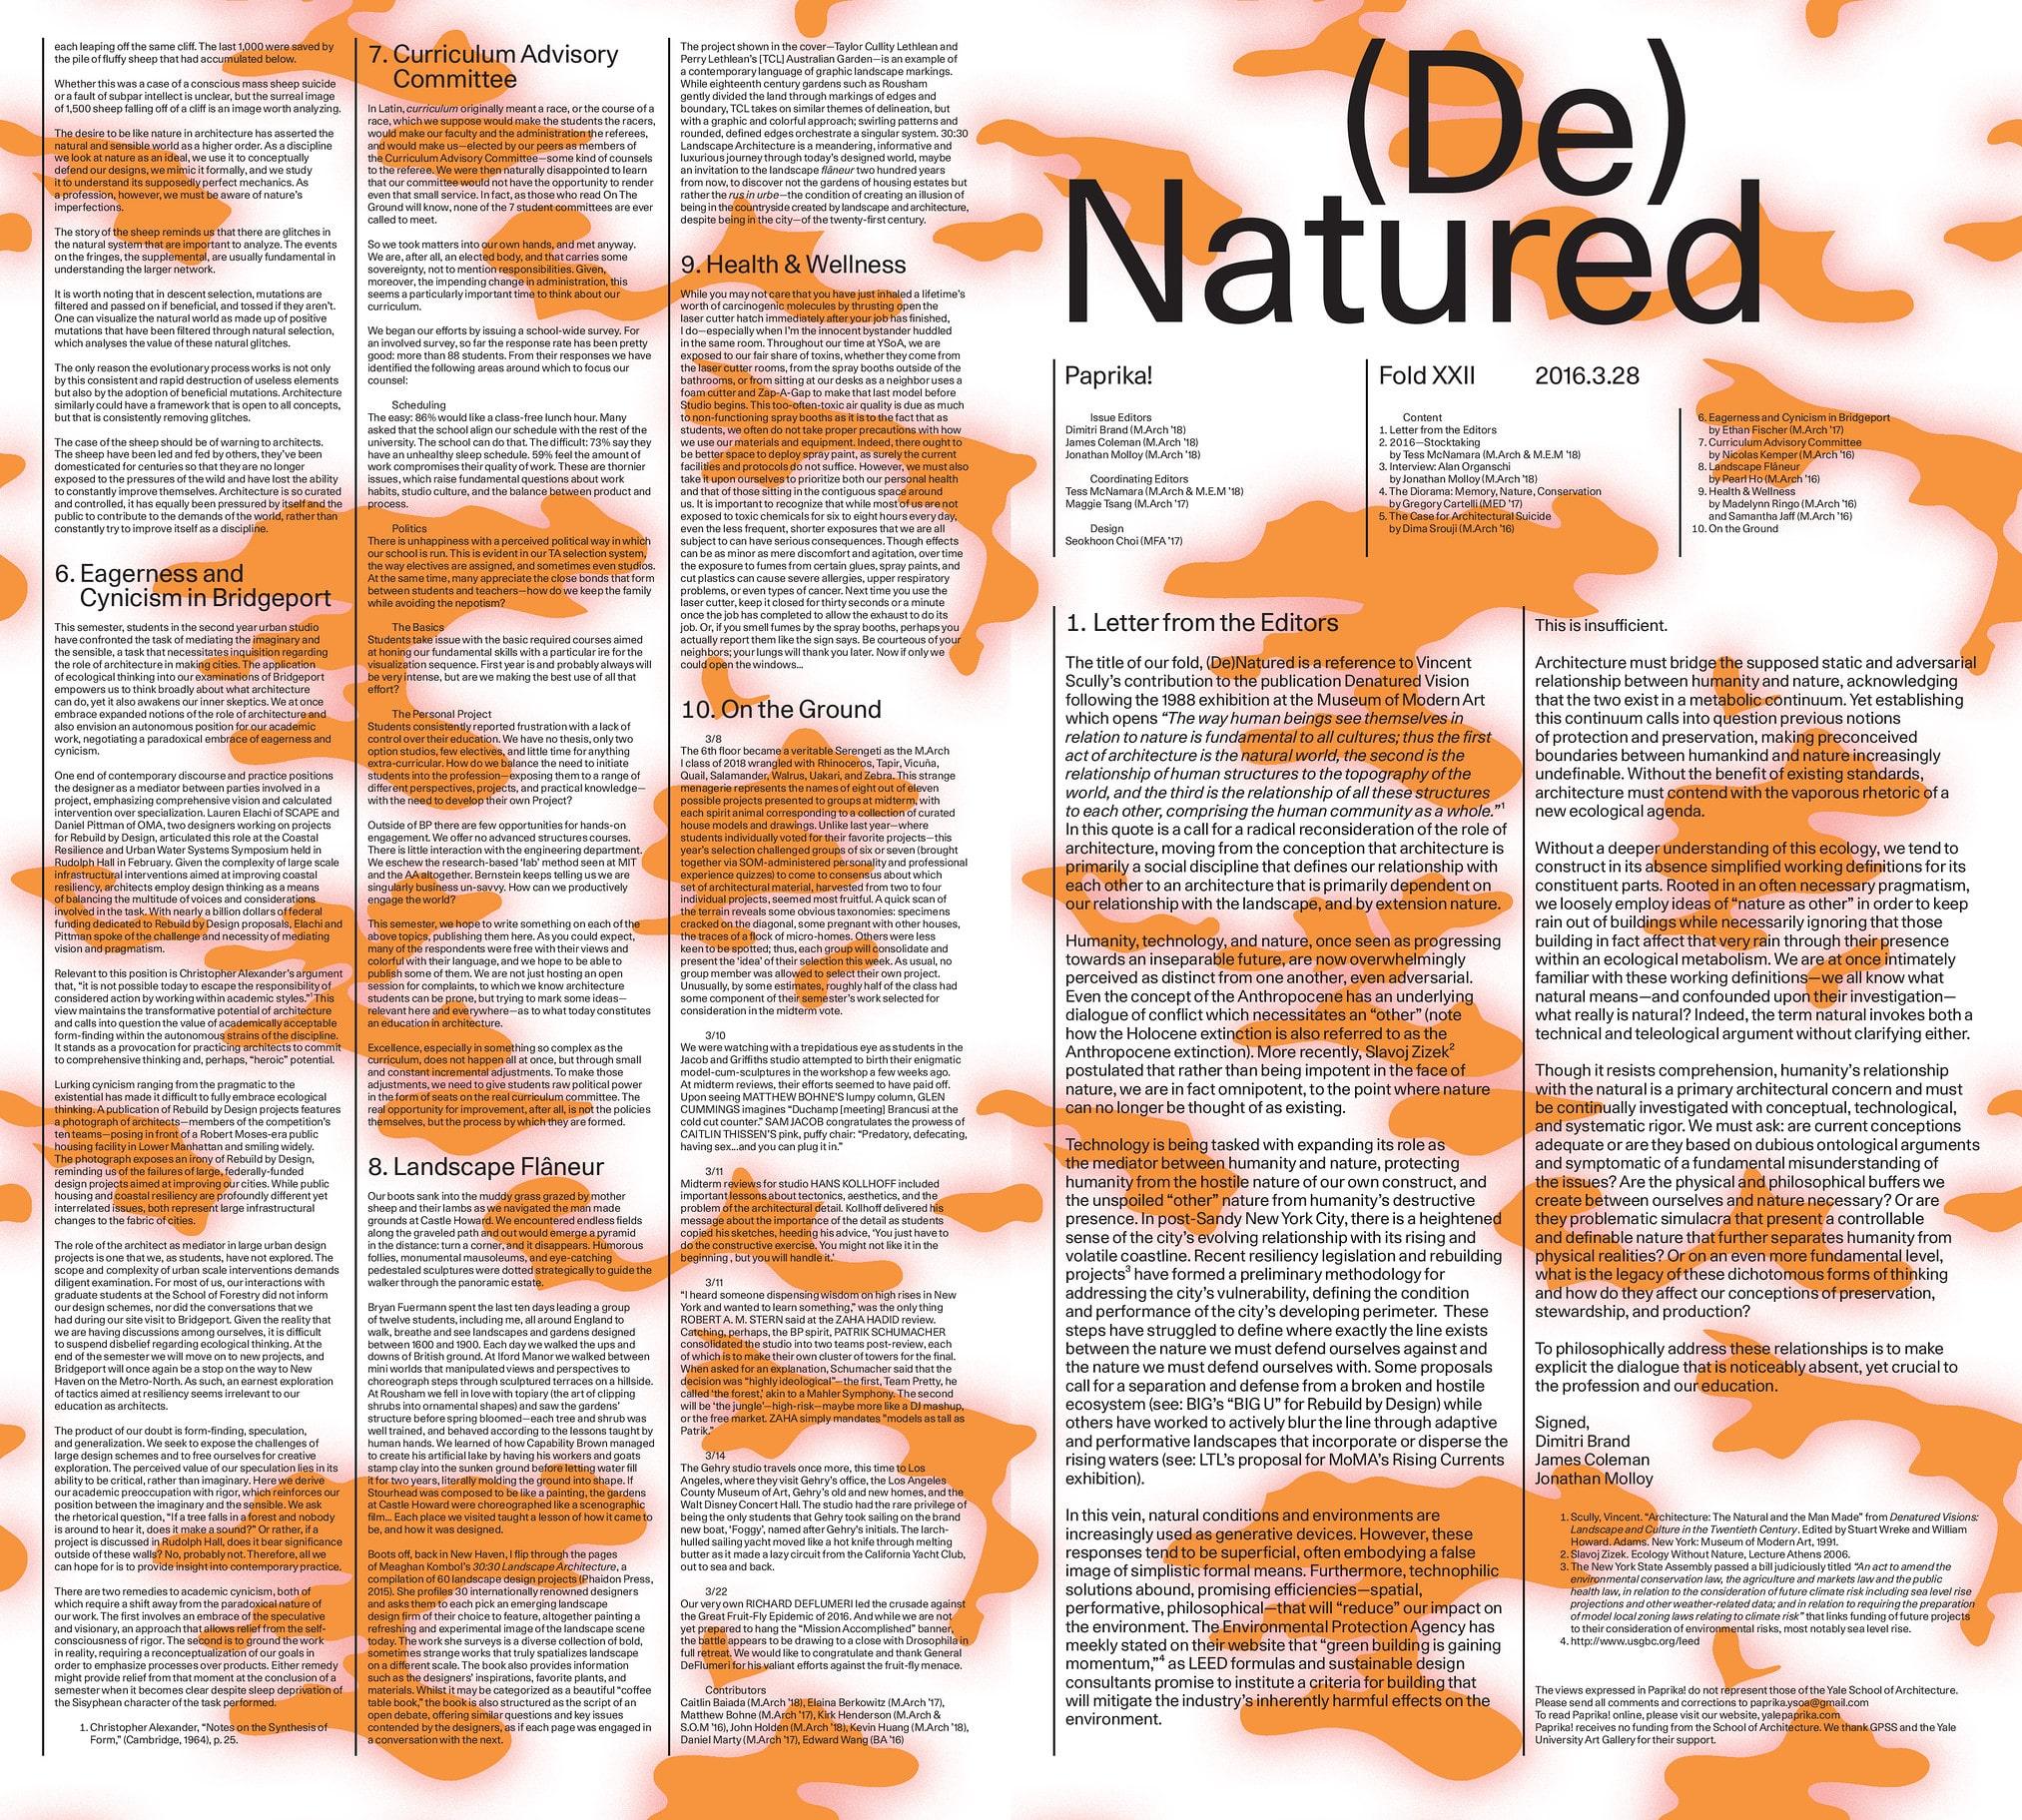 1-22 (de)Natured